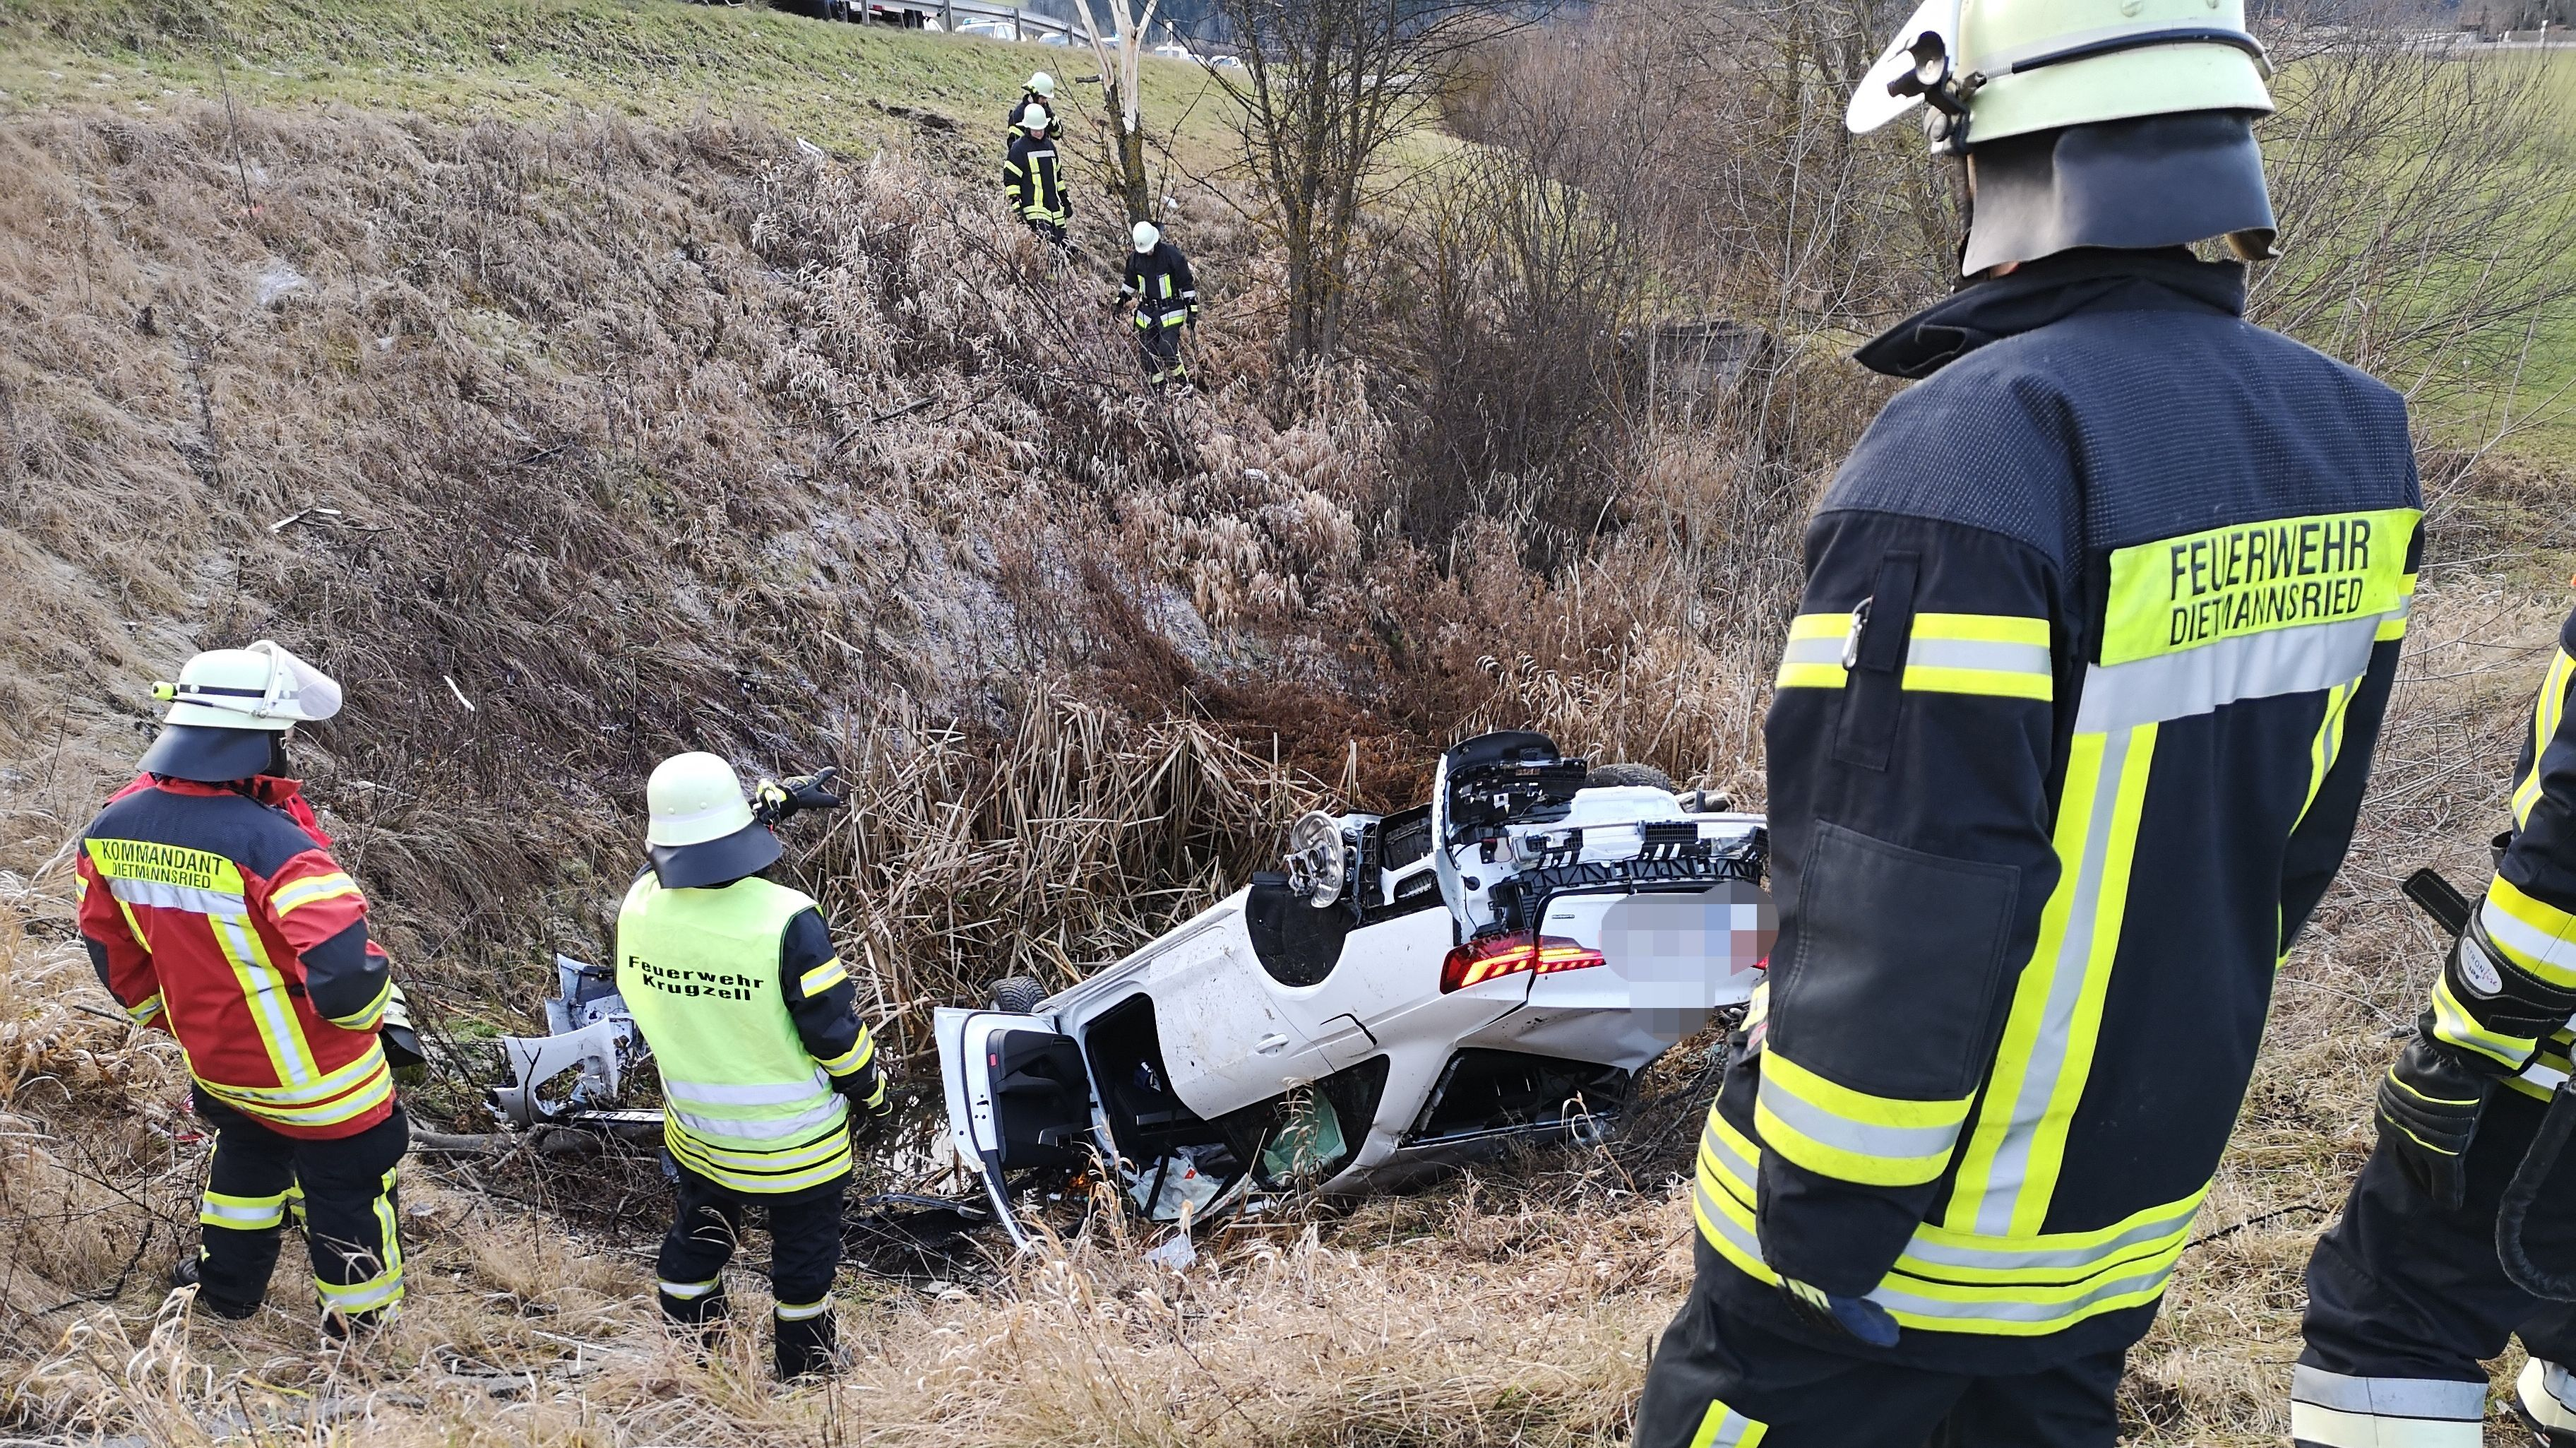 Feuerwehrleute am Unfallort bei Krugzell